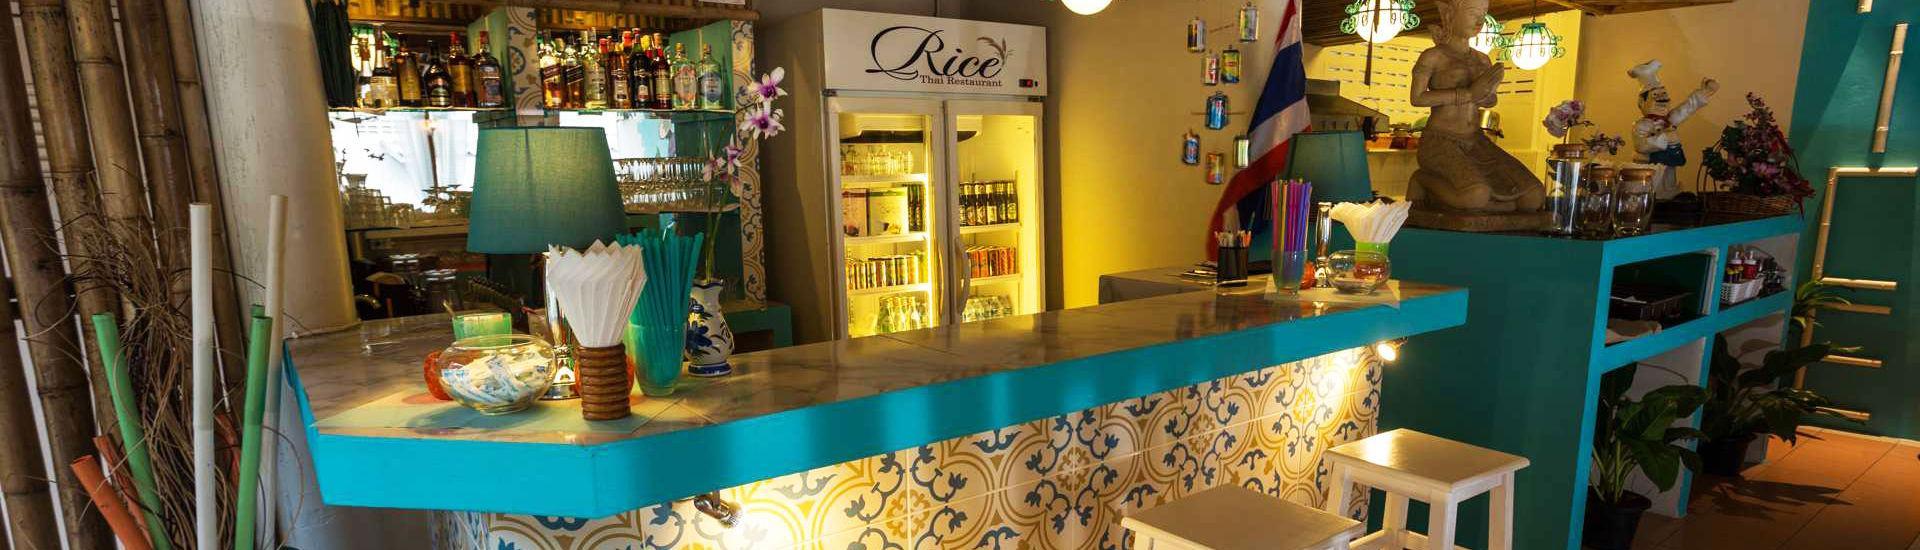 Thai Food Restaurant Inside